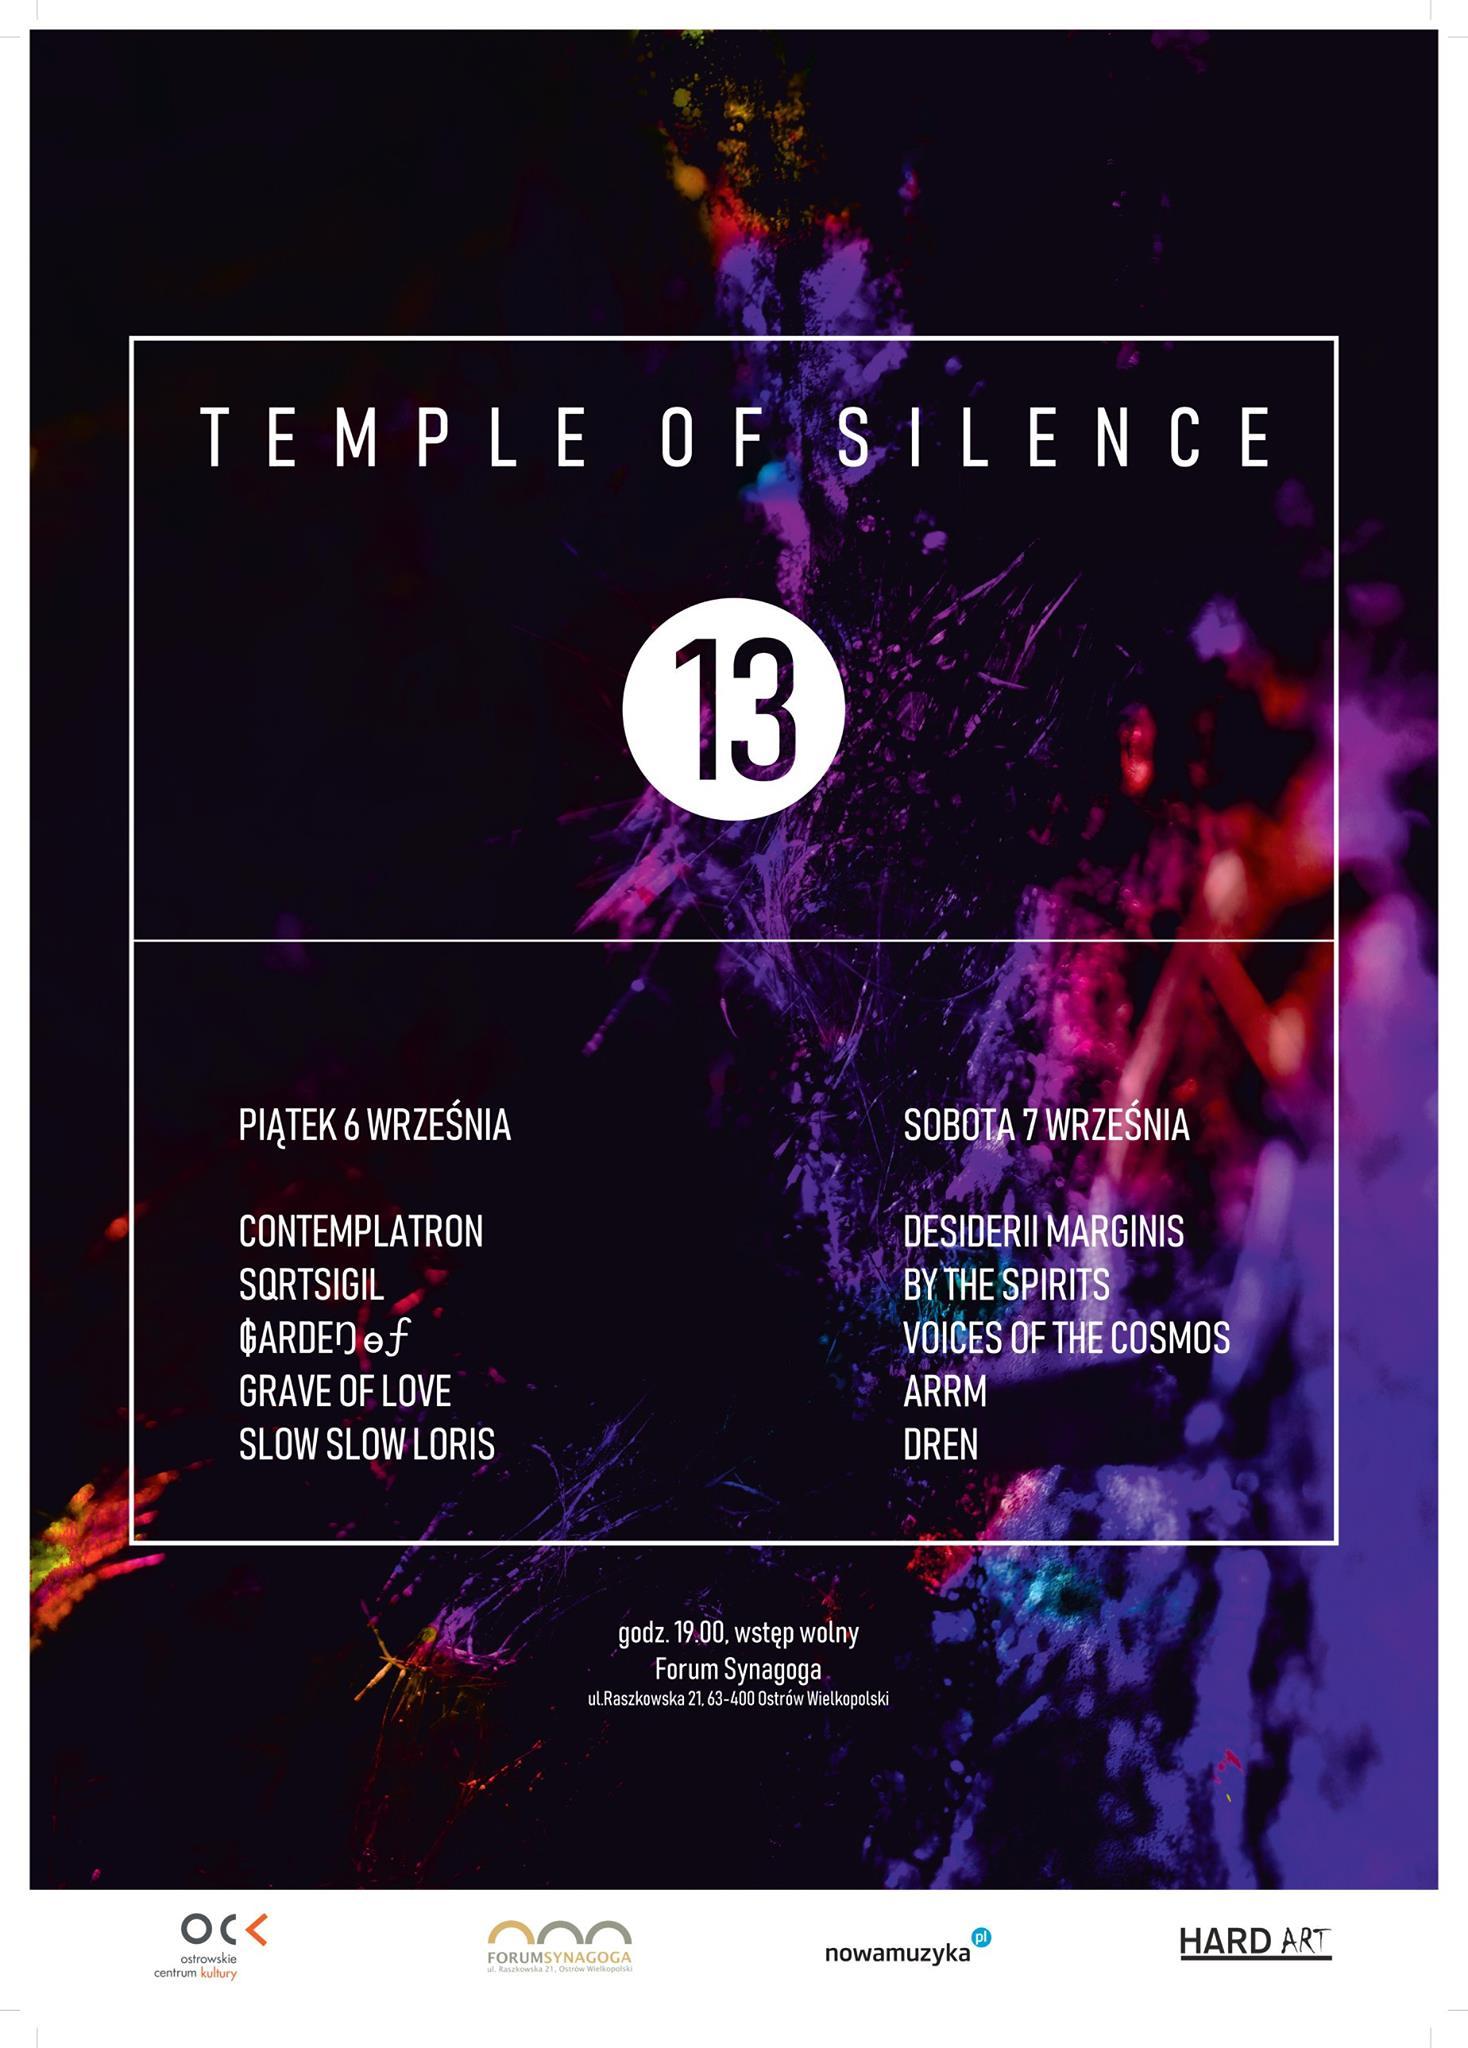 Sept 6, 2019 - Temple Of Silence vol13 at Forum SynagogaEvent Linkul.Raszkowska 21, 63-400 Ostrów Wielkopolski, Poland